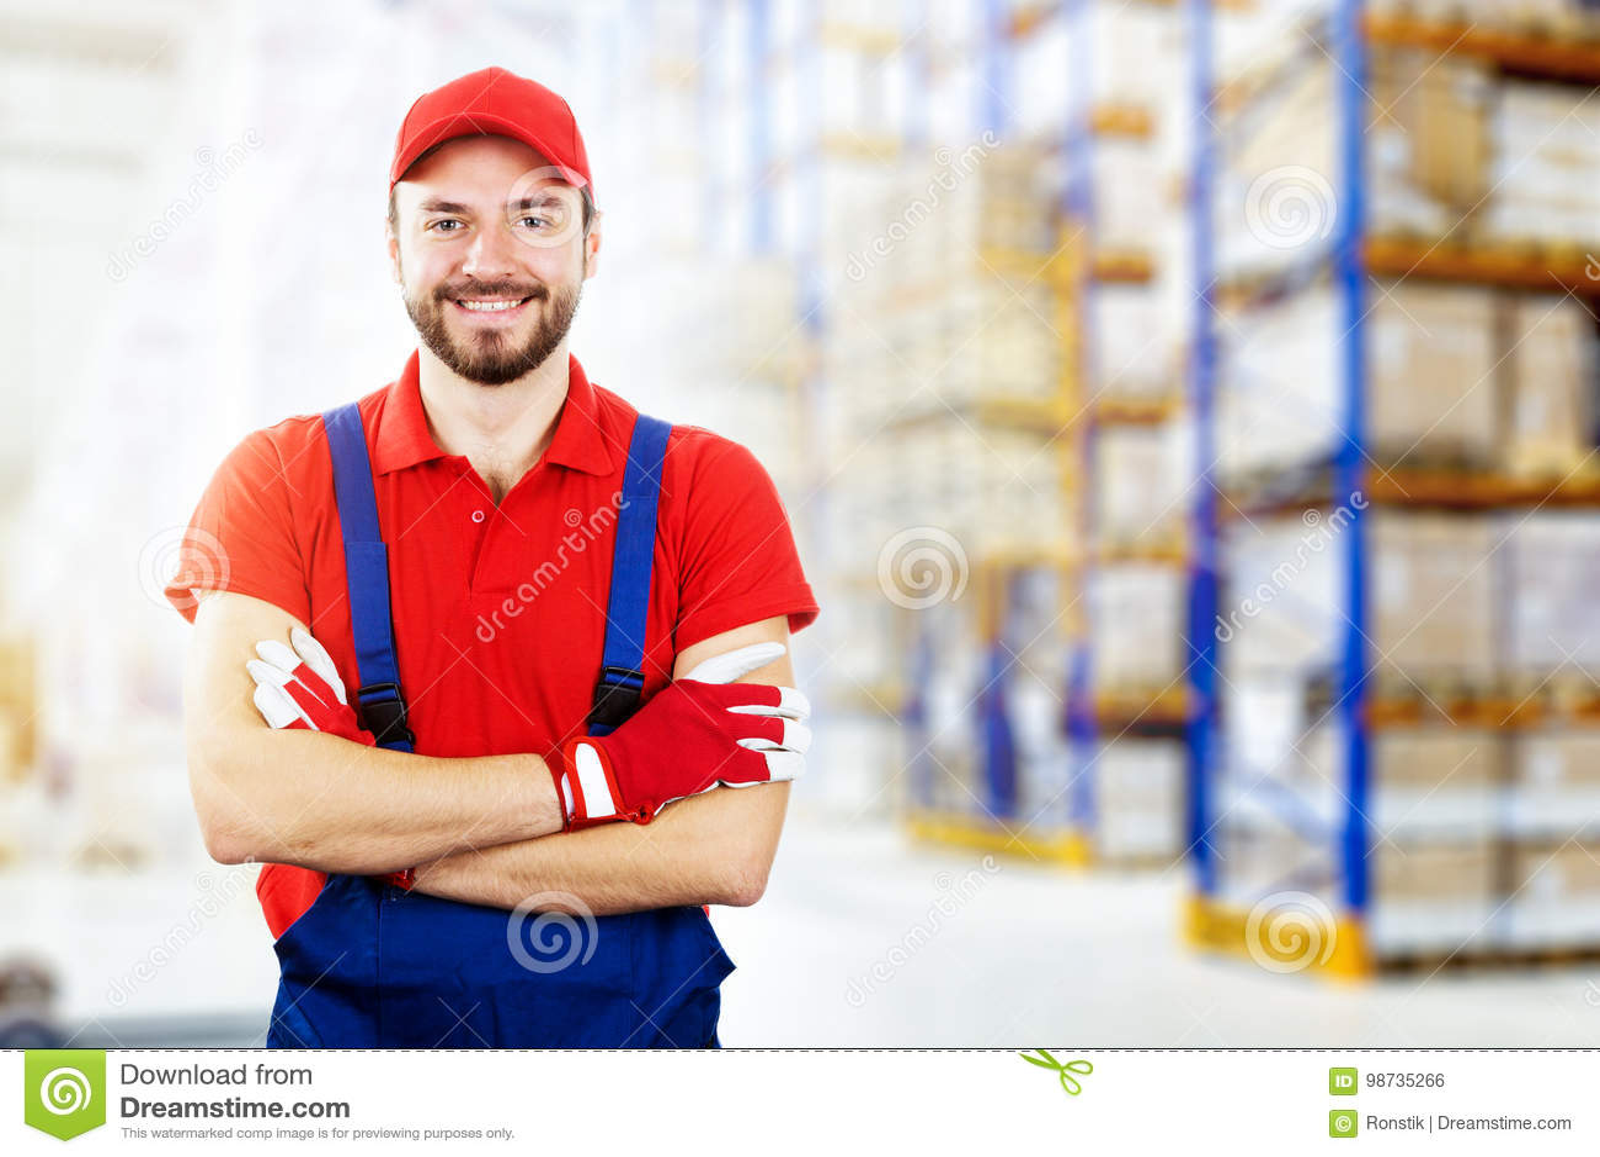 Glimlachende jonge pakhuisarbeider in rode eenvormig